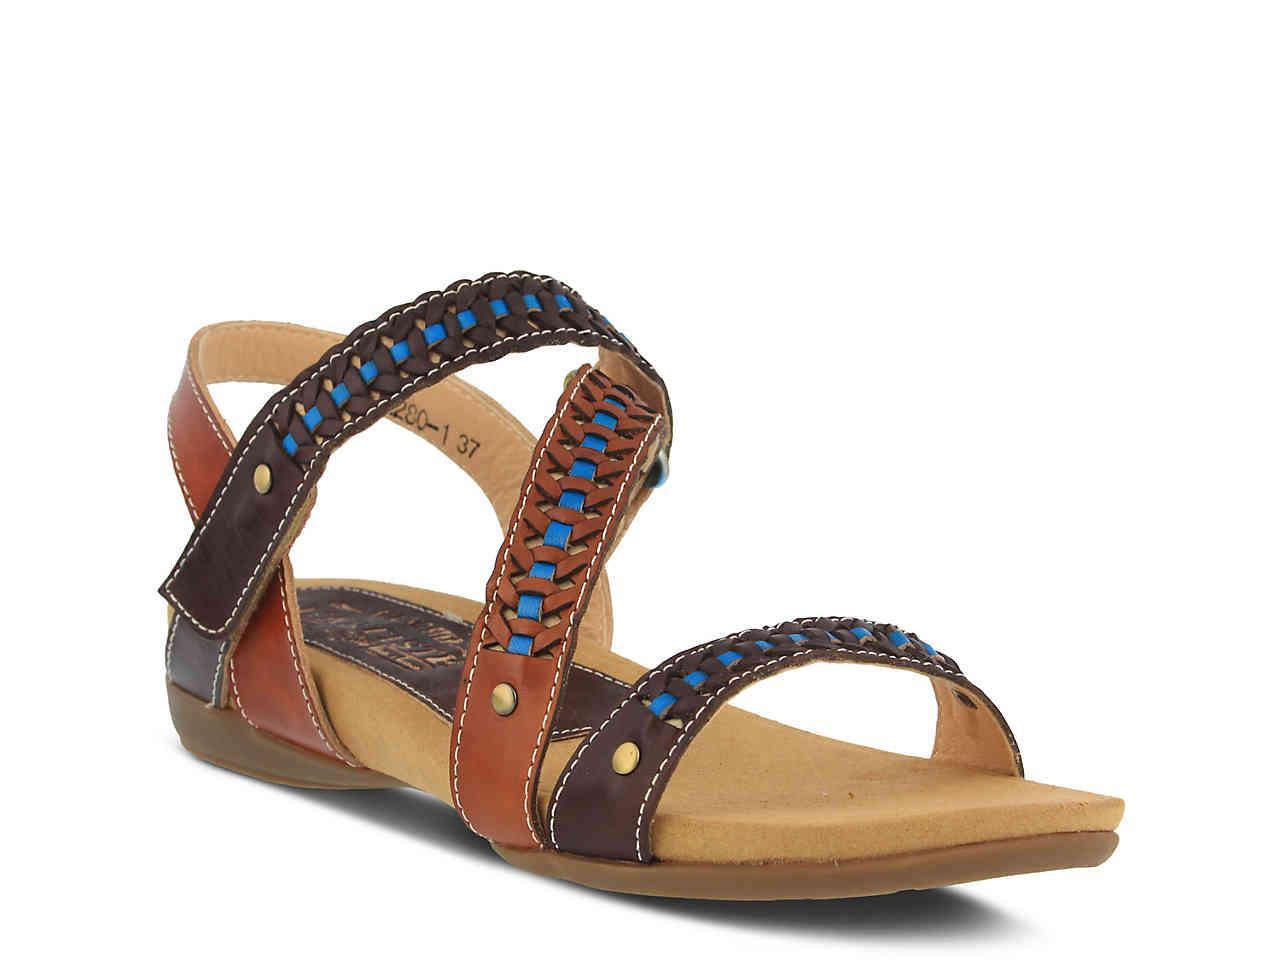 bf7f5caae0a Lyst - Spring Step Joaquima Wedge Sandal in Brown